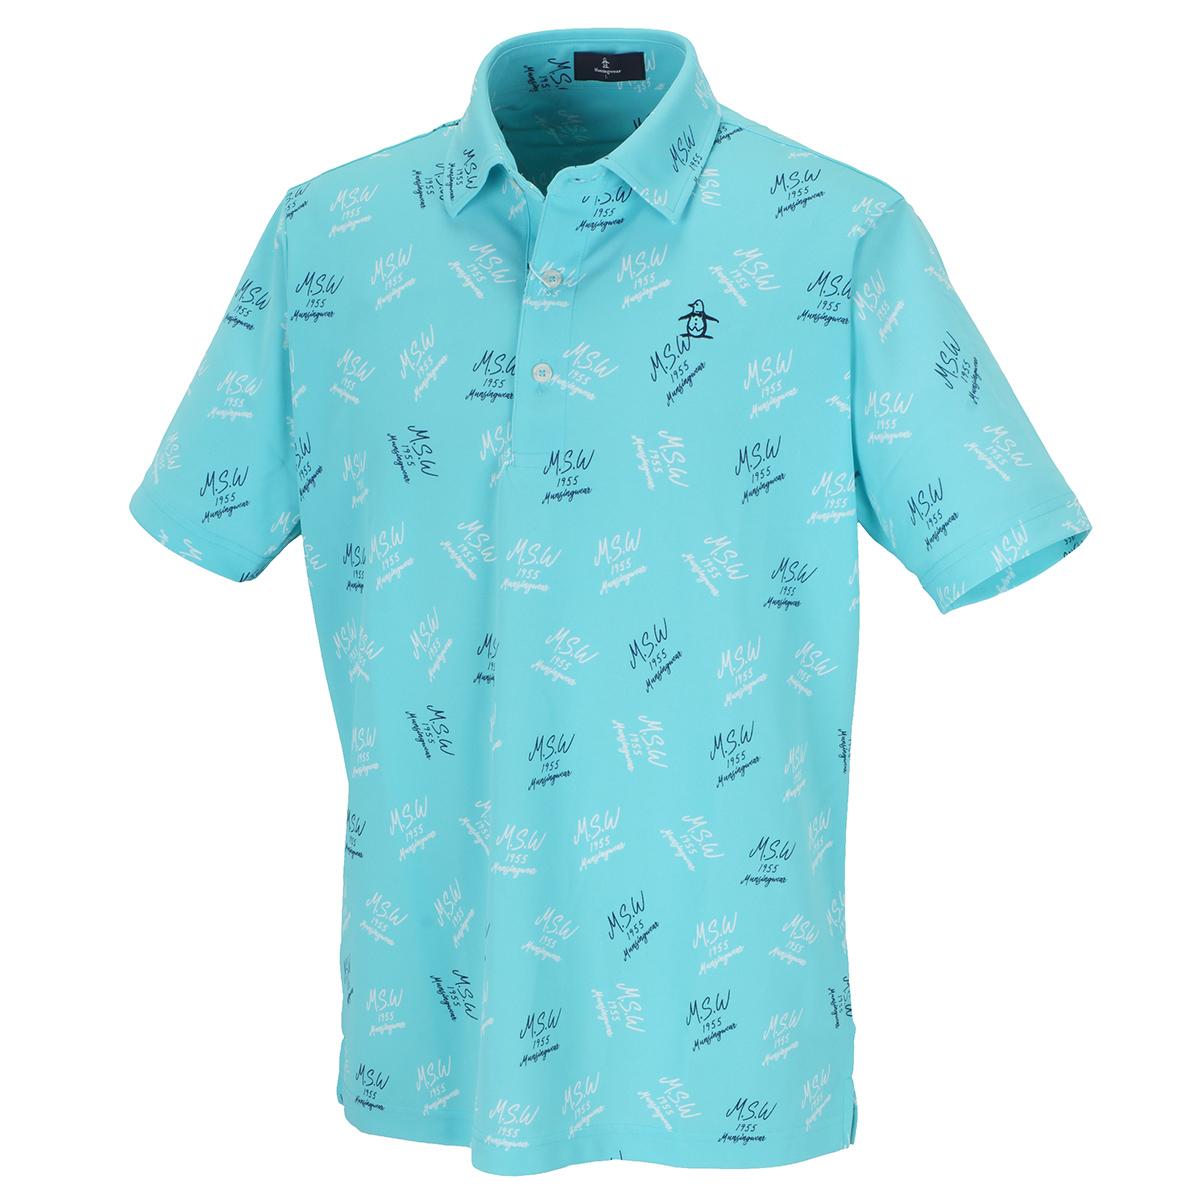 COOLIST総柄ロゴプリント半袖ポロシャツ